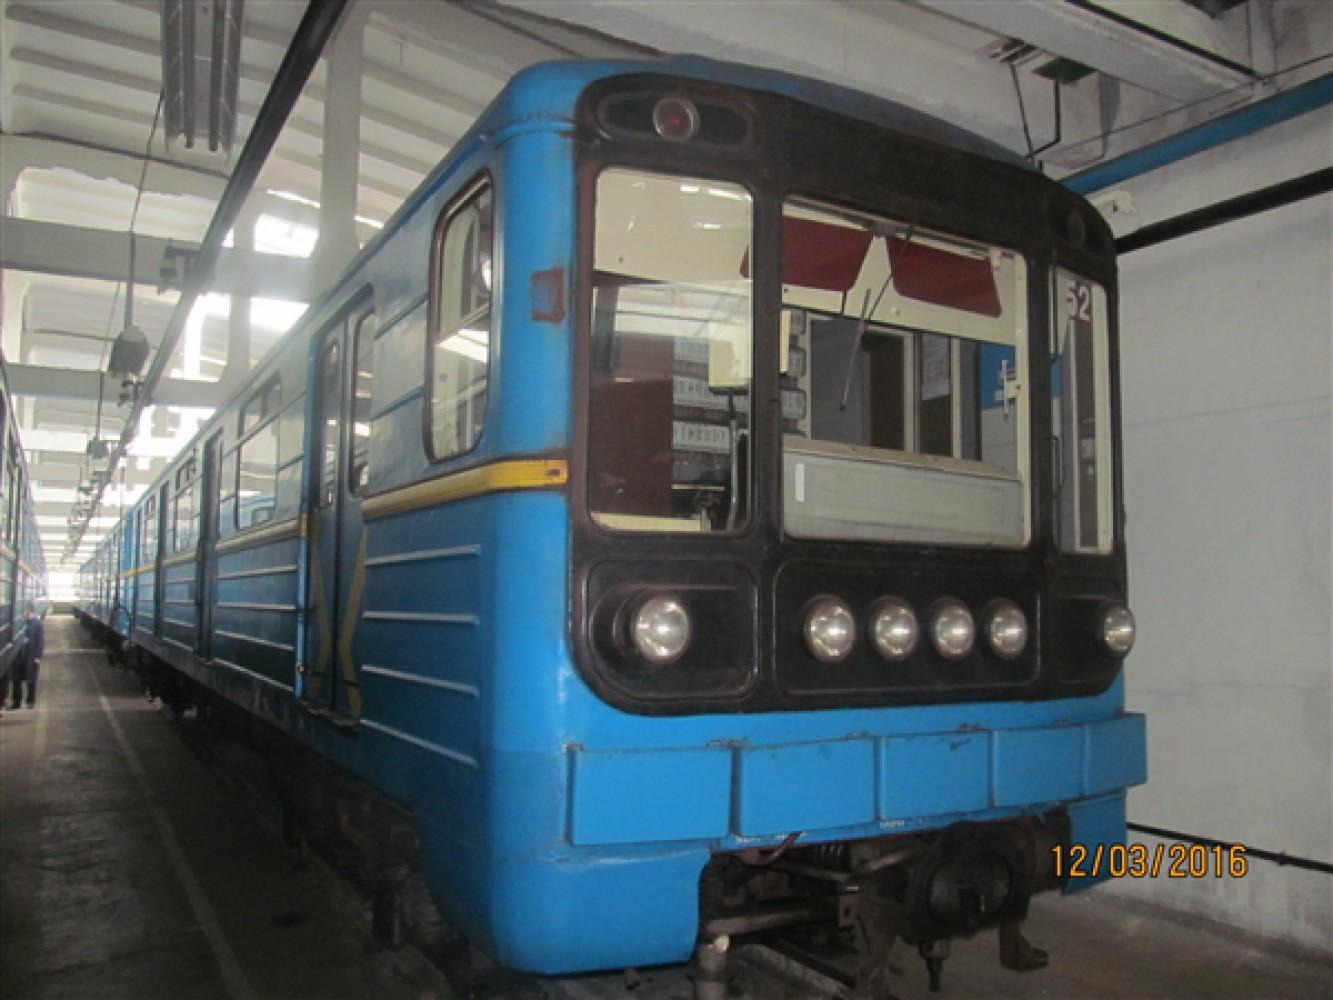 ВКиеве саукциона реализуют вагоны метро